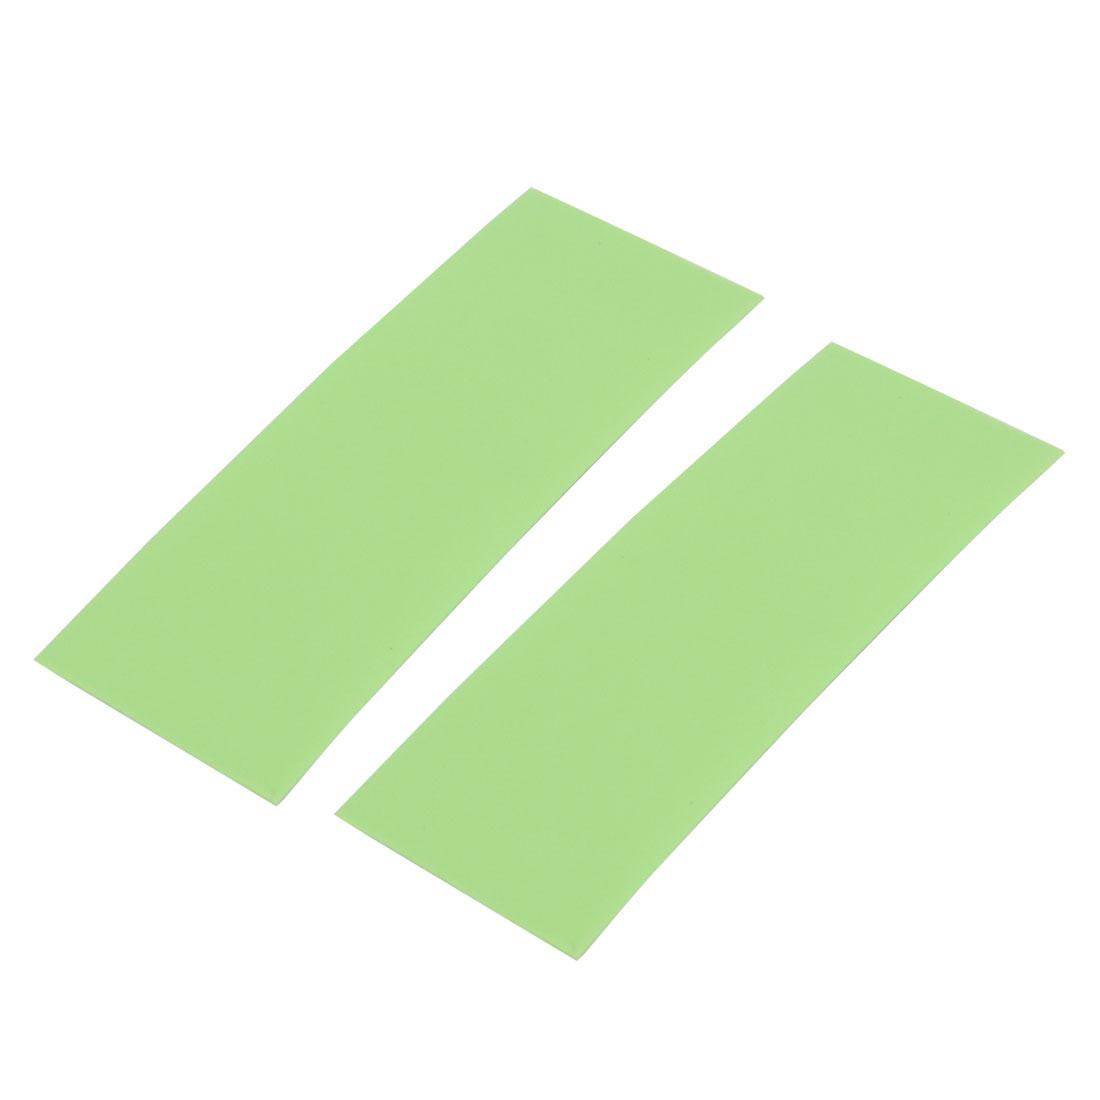 2pcs 17mm Flat Width 46mm Long Heat Shrinkable Tube Light Green for AAA Battery